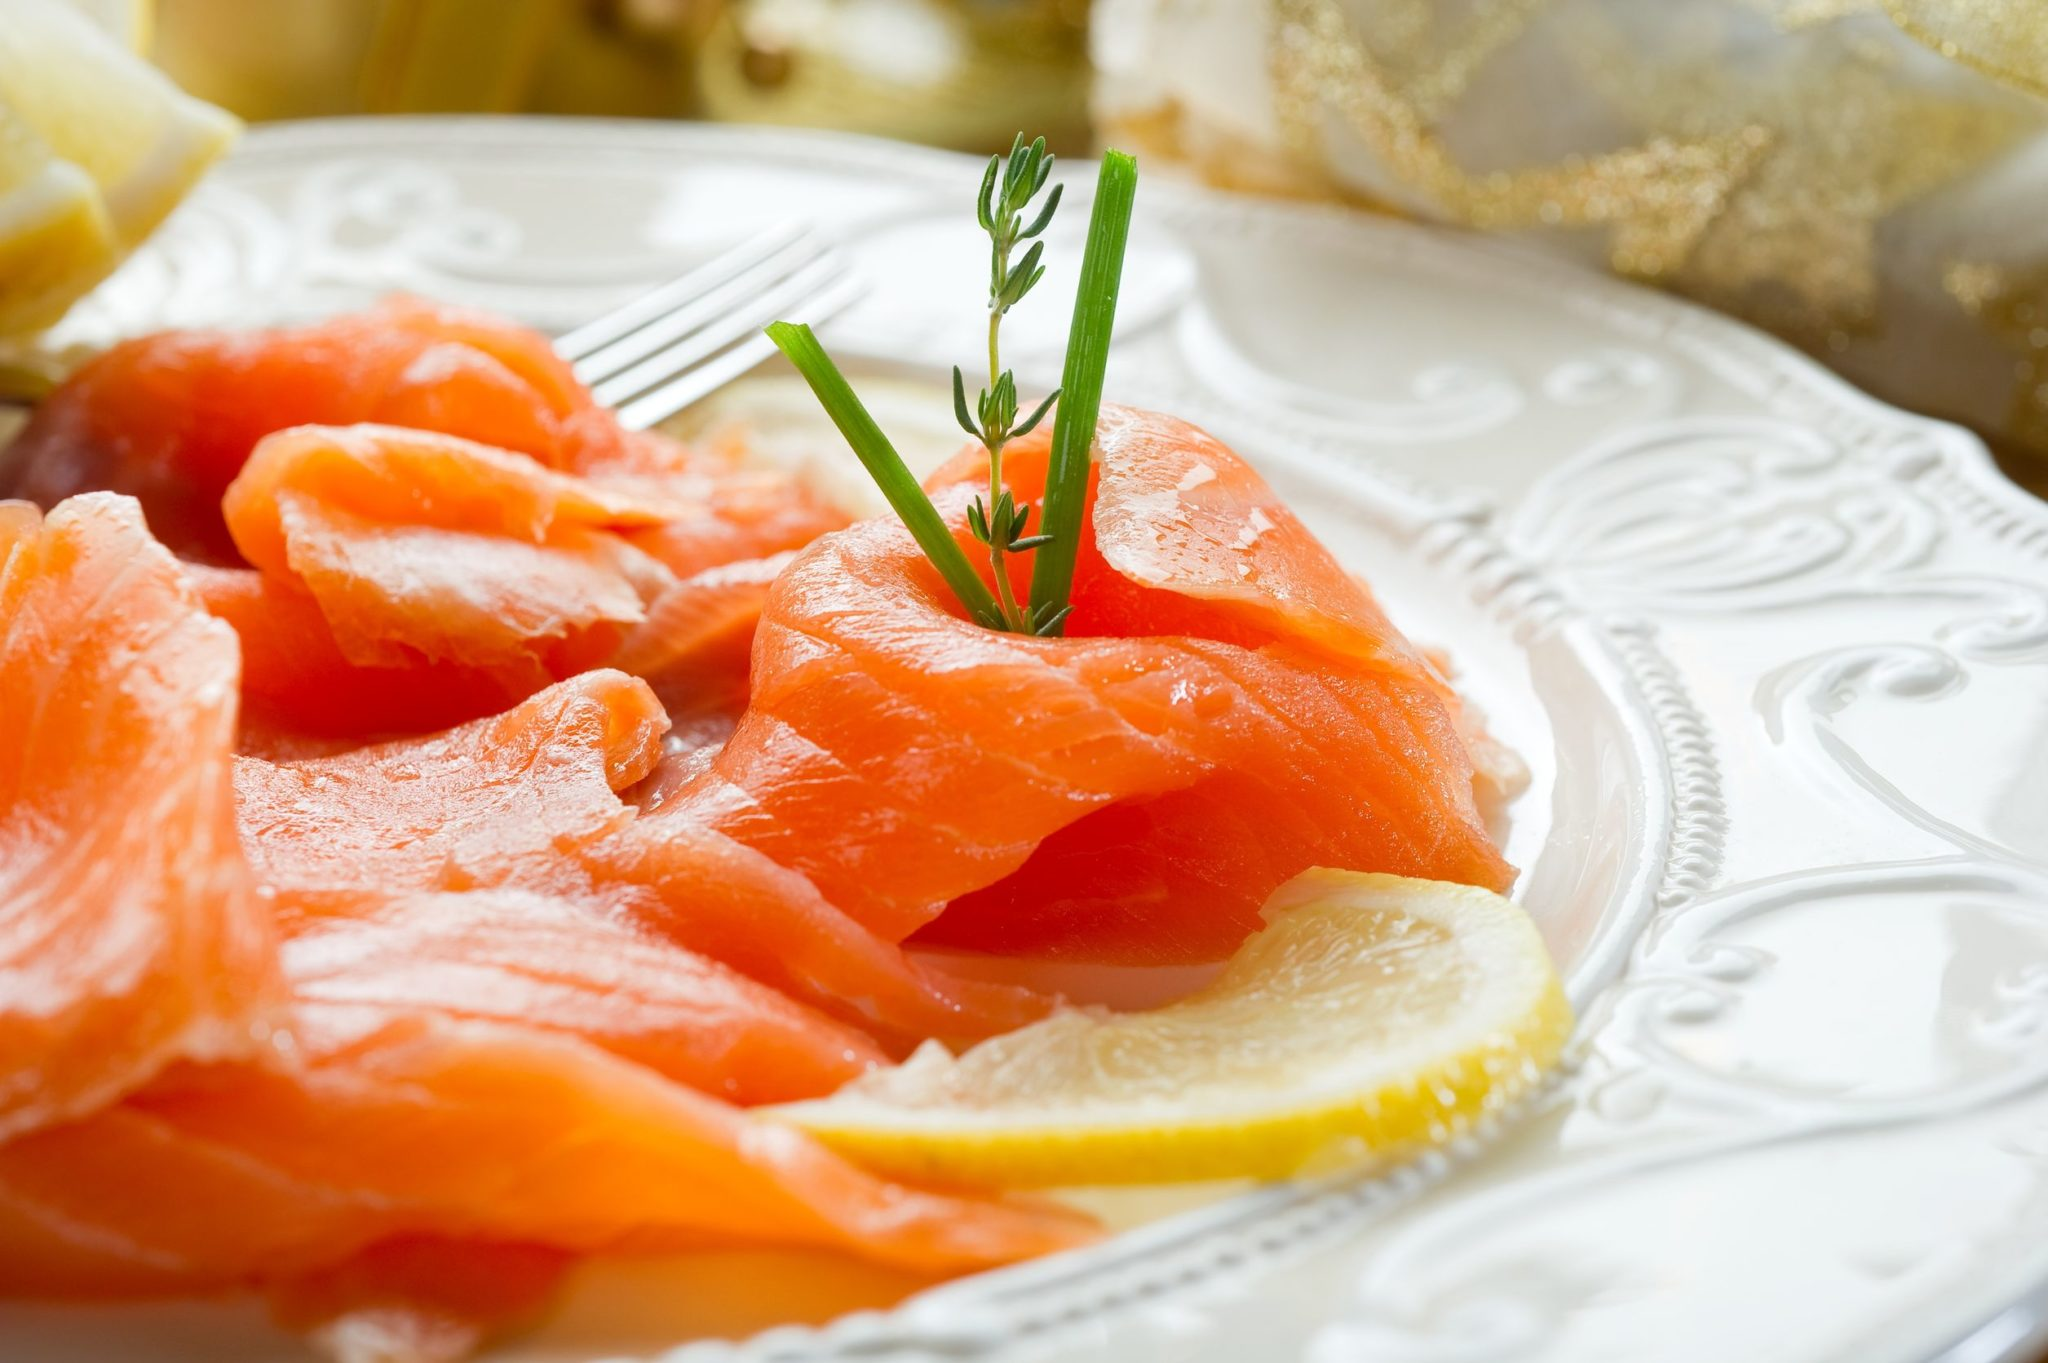 Taratata Brasserie - Smoked Salmon